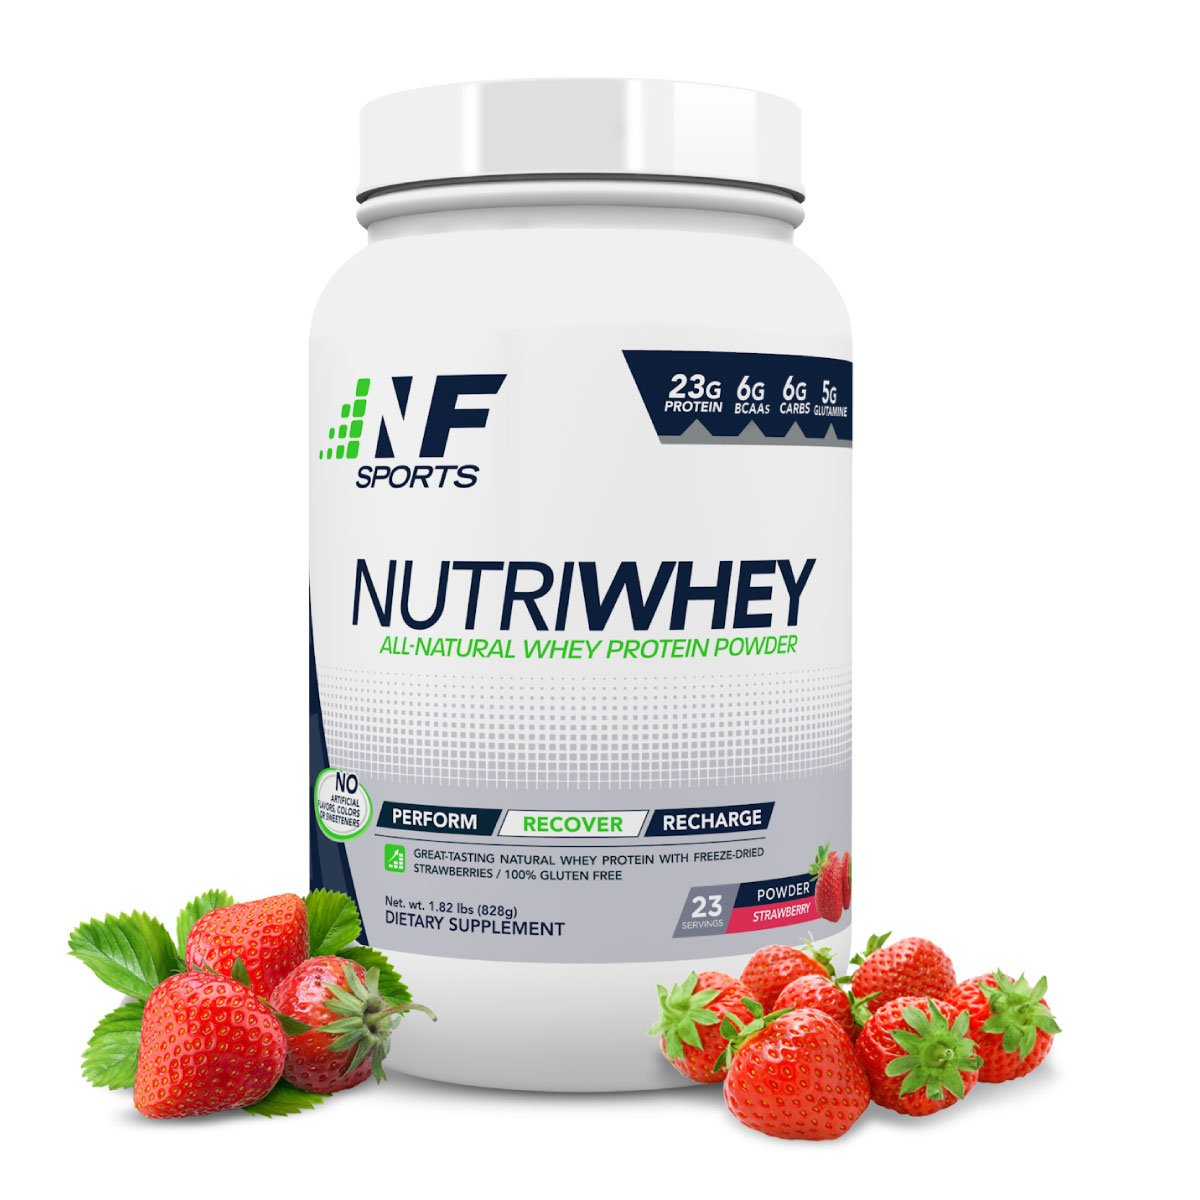 Image of NutriWhey - Strawberry